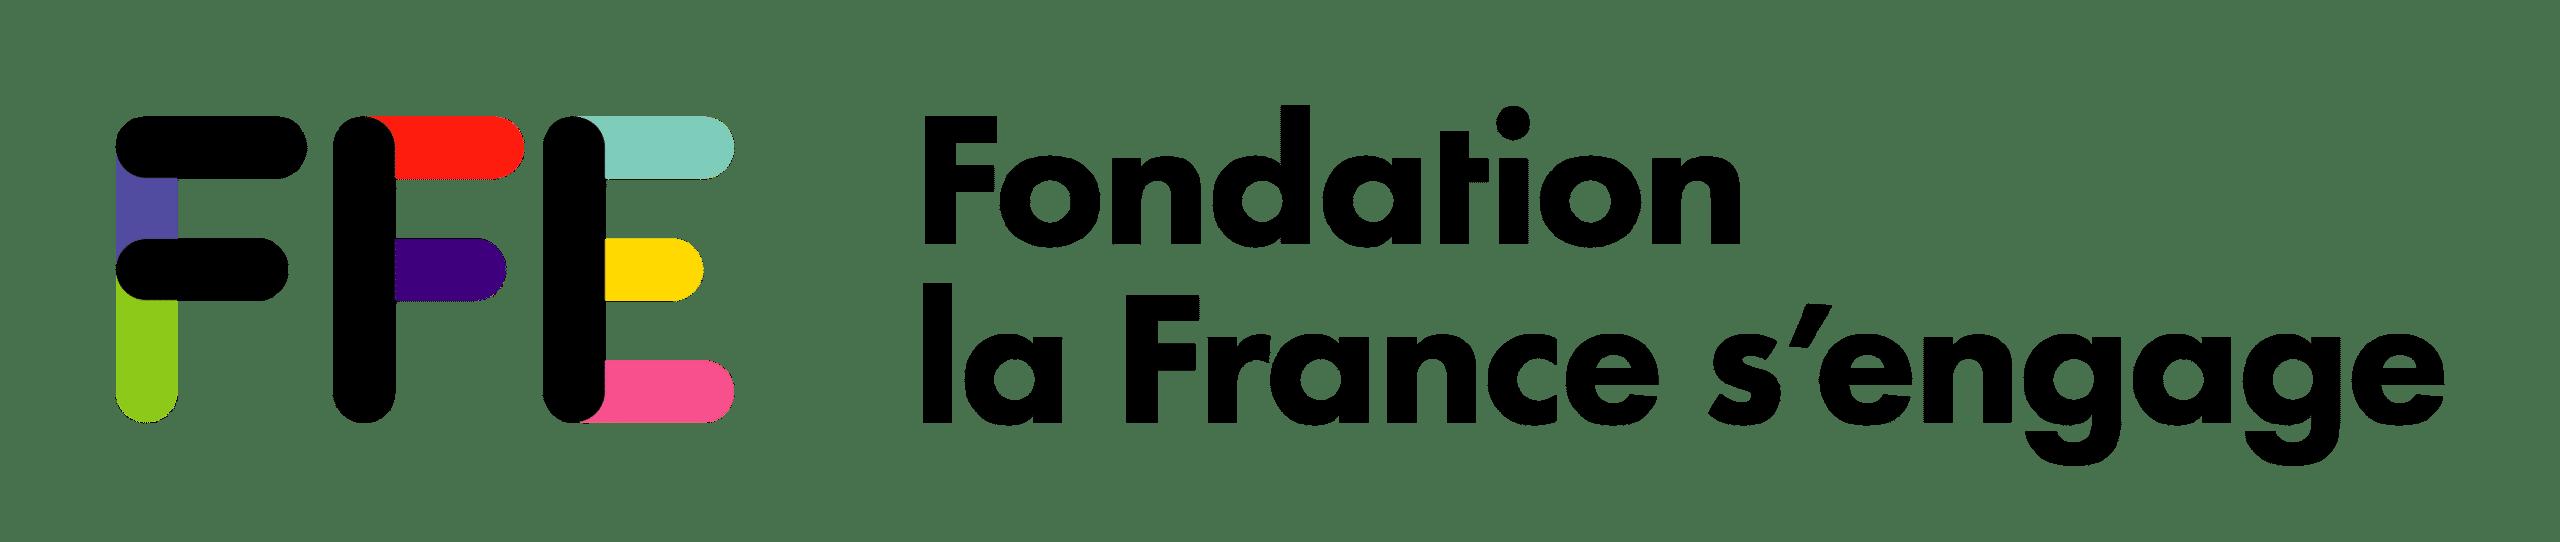 FFE – La Fondation la France s'engage